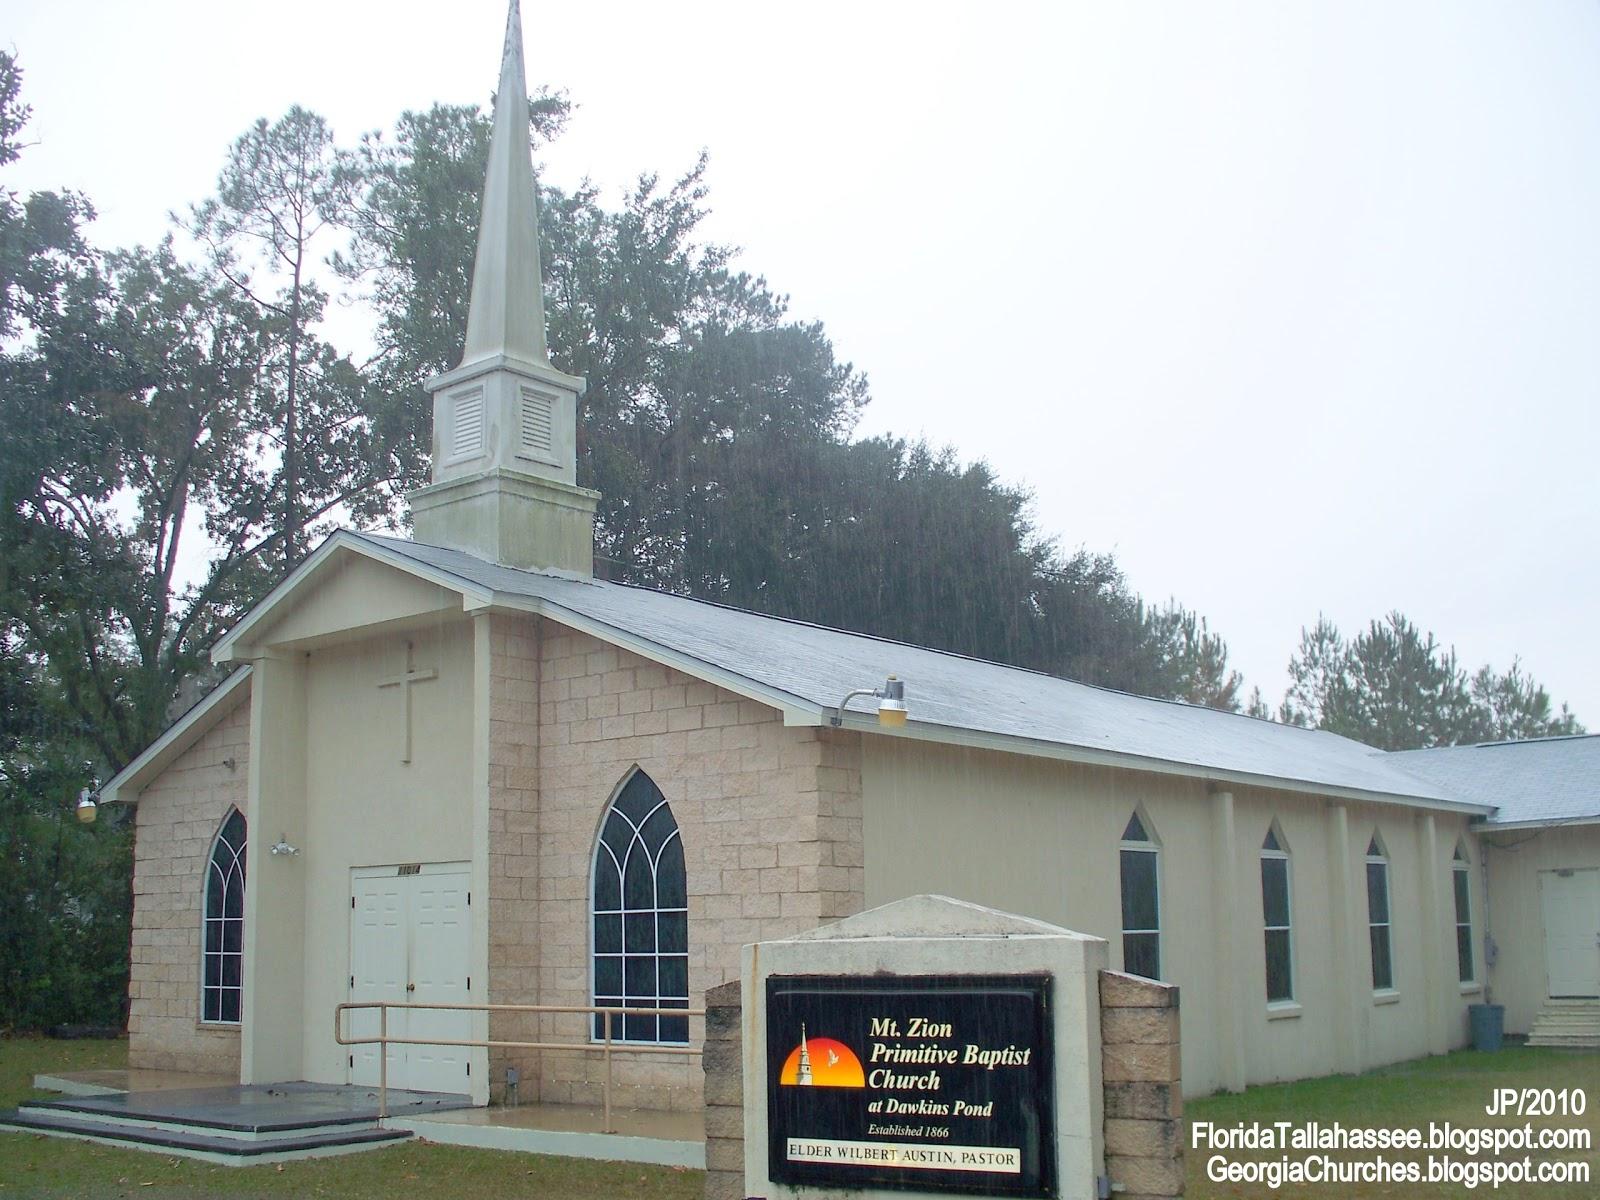 Wonderful Baptist Churches In Tallahassee Fl #1: BAPTIST+CHURCHES,+Mt.+ZION+BAPTIST+CHURCH,Mt.+Zion+Primitive+at+Dawkins+Pond,Tallahassee+Florida+Leon+County.JPG